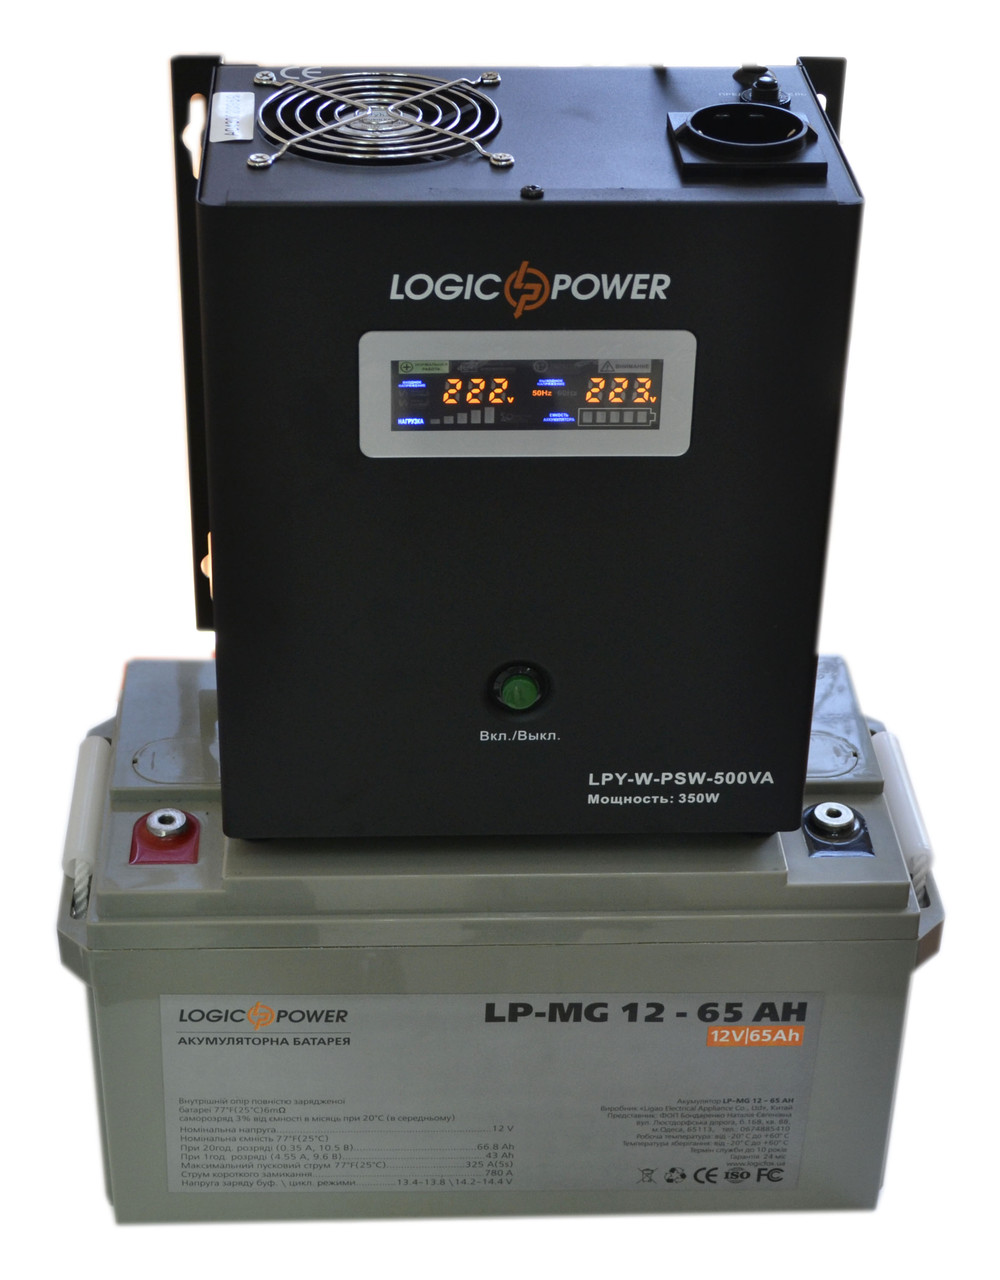 Комплект резервного питания ИБП Logicpower LPY-W-PSW-500 + АКБ LP-MG65 для 5-7ч работы газового котла